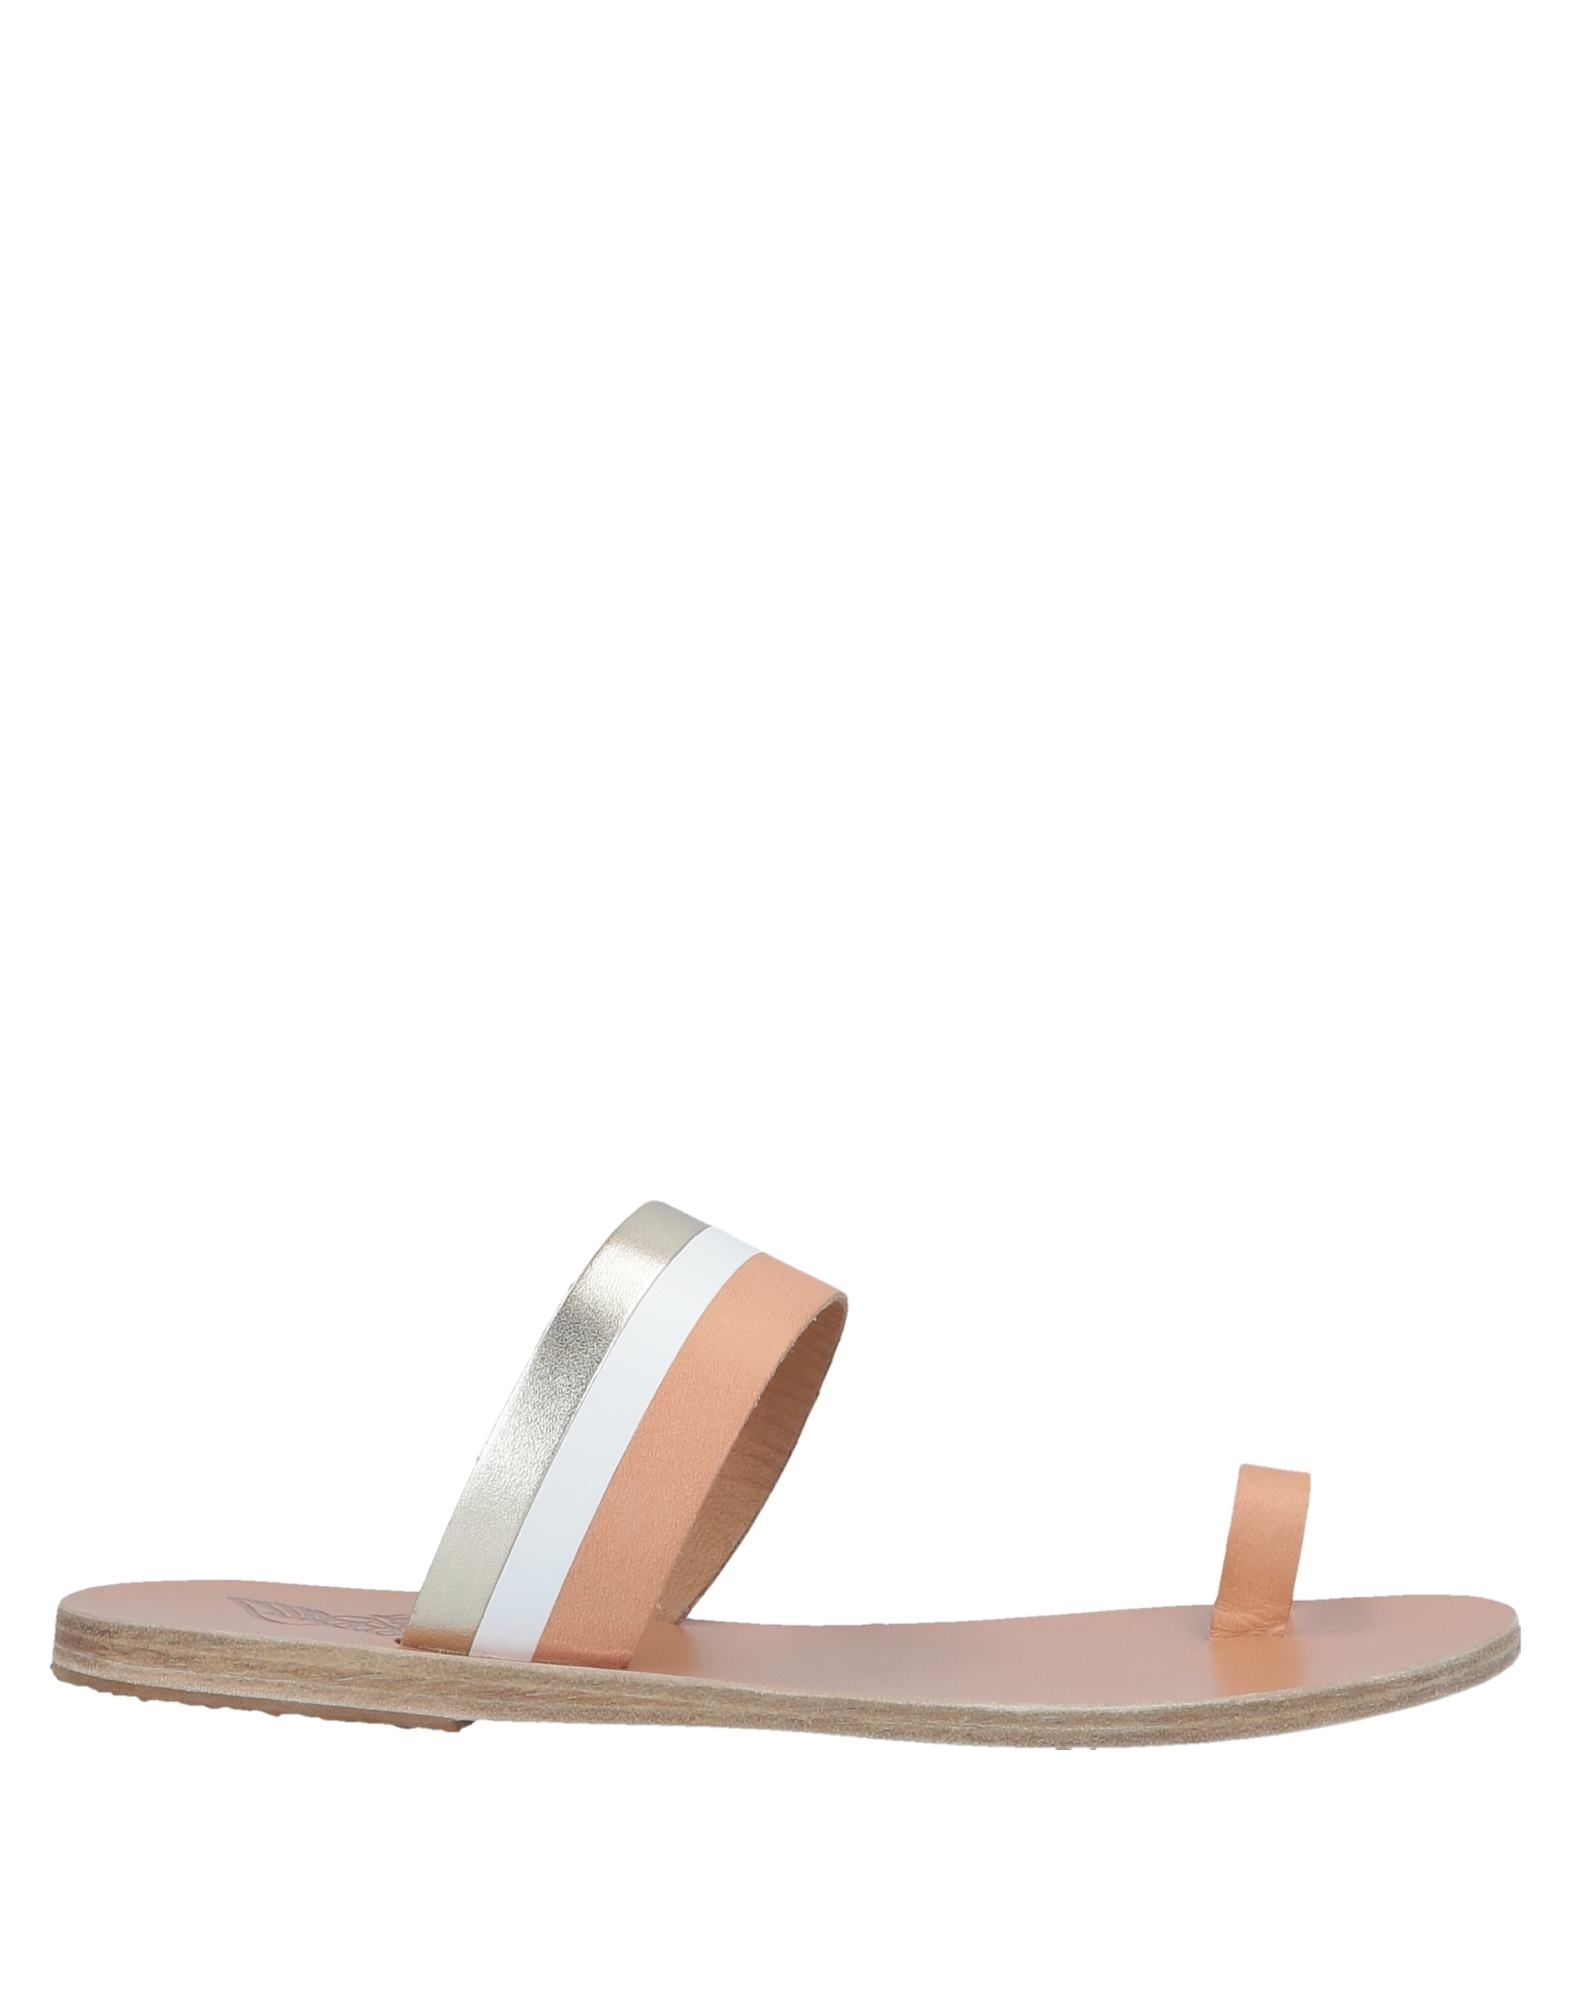 ANCIENT GREEK SANDALS Вьетнамки xda 2018 new summer sandals women flat shoes bandage bohemia leisure lady casual sandals peep toe outdoor fashion sandals f171